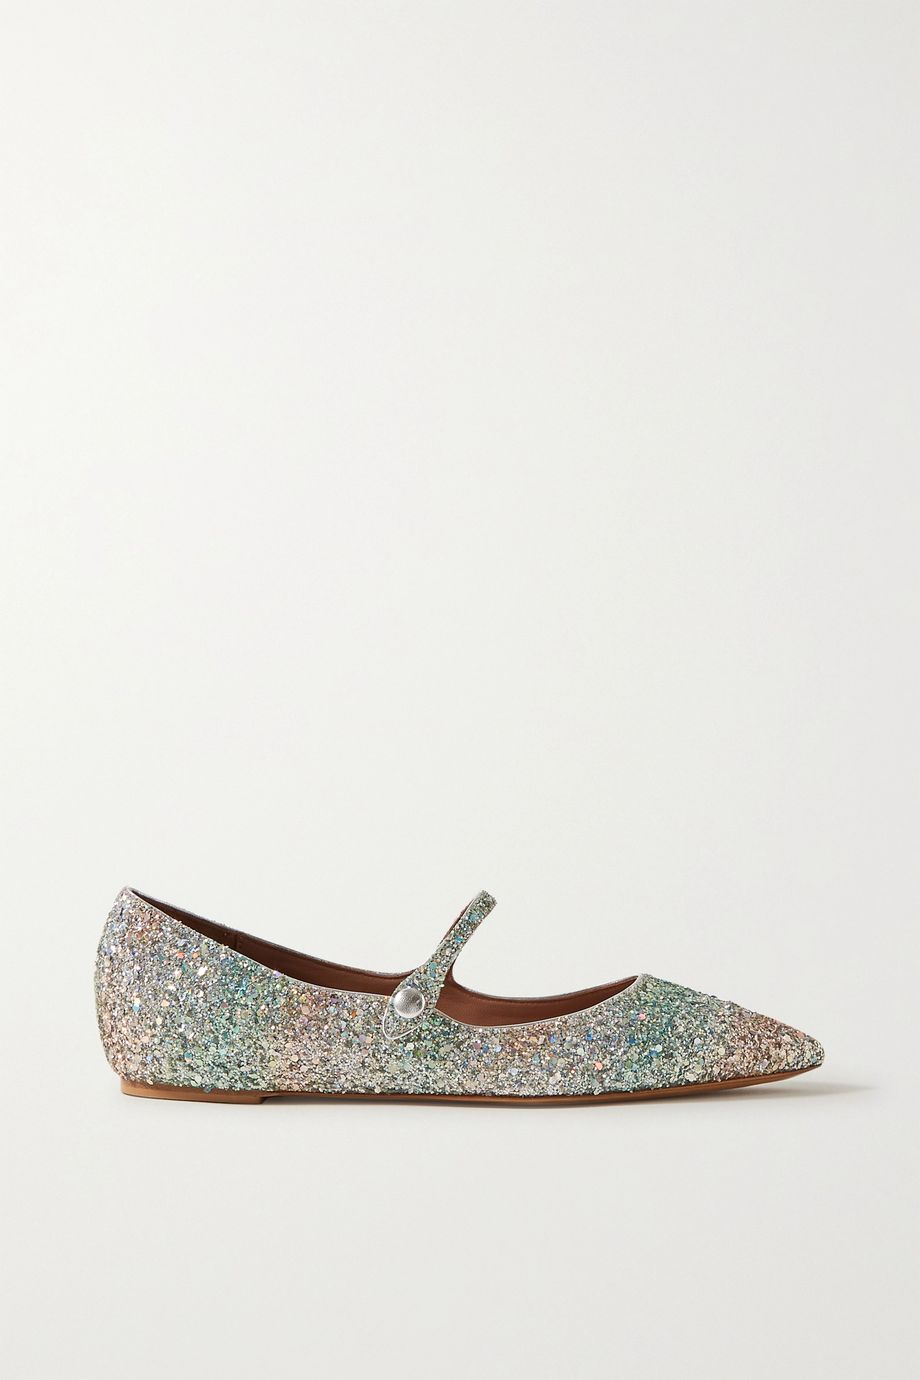 Tabitha Simmons Hermione glittered metallic leather point-toe flats